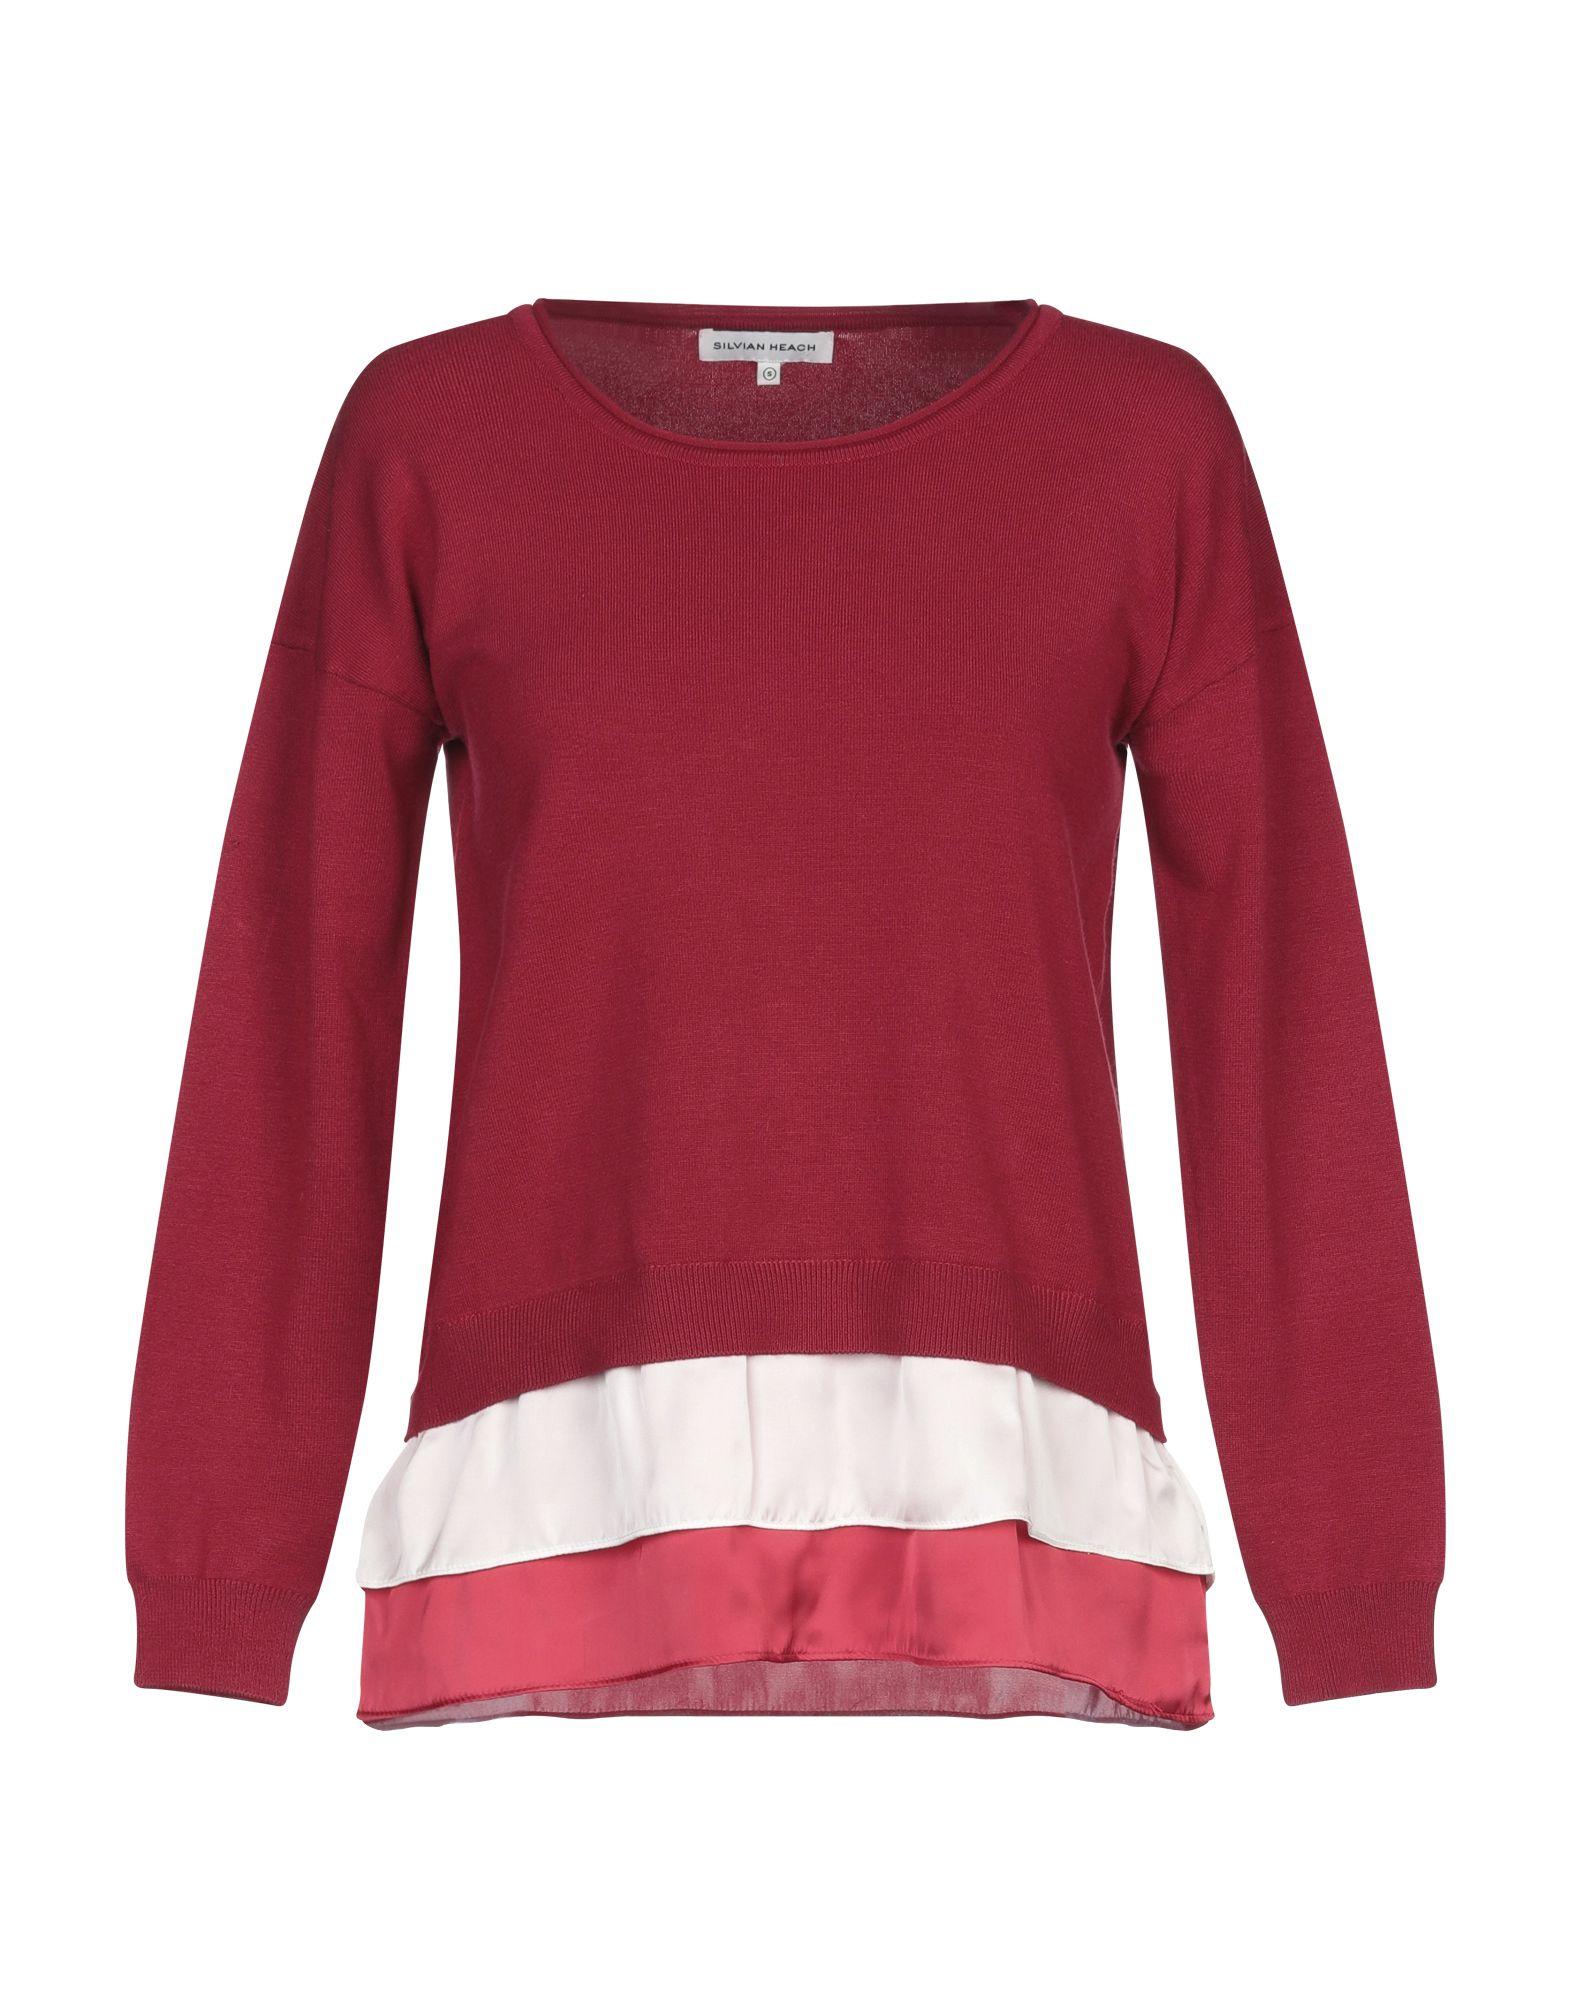 SILVIAN HEACH Свитер свитер женский silvian heach hervey цвет фиолетовый cva18067ma mauve размер m 44